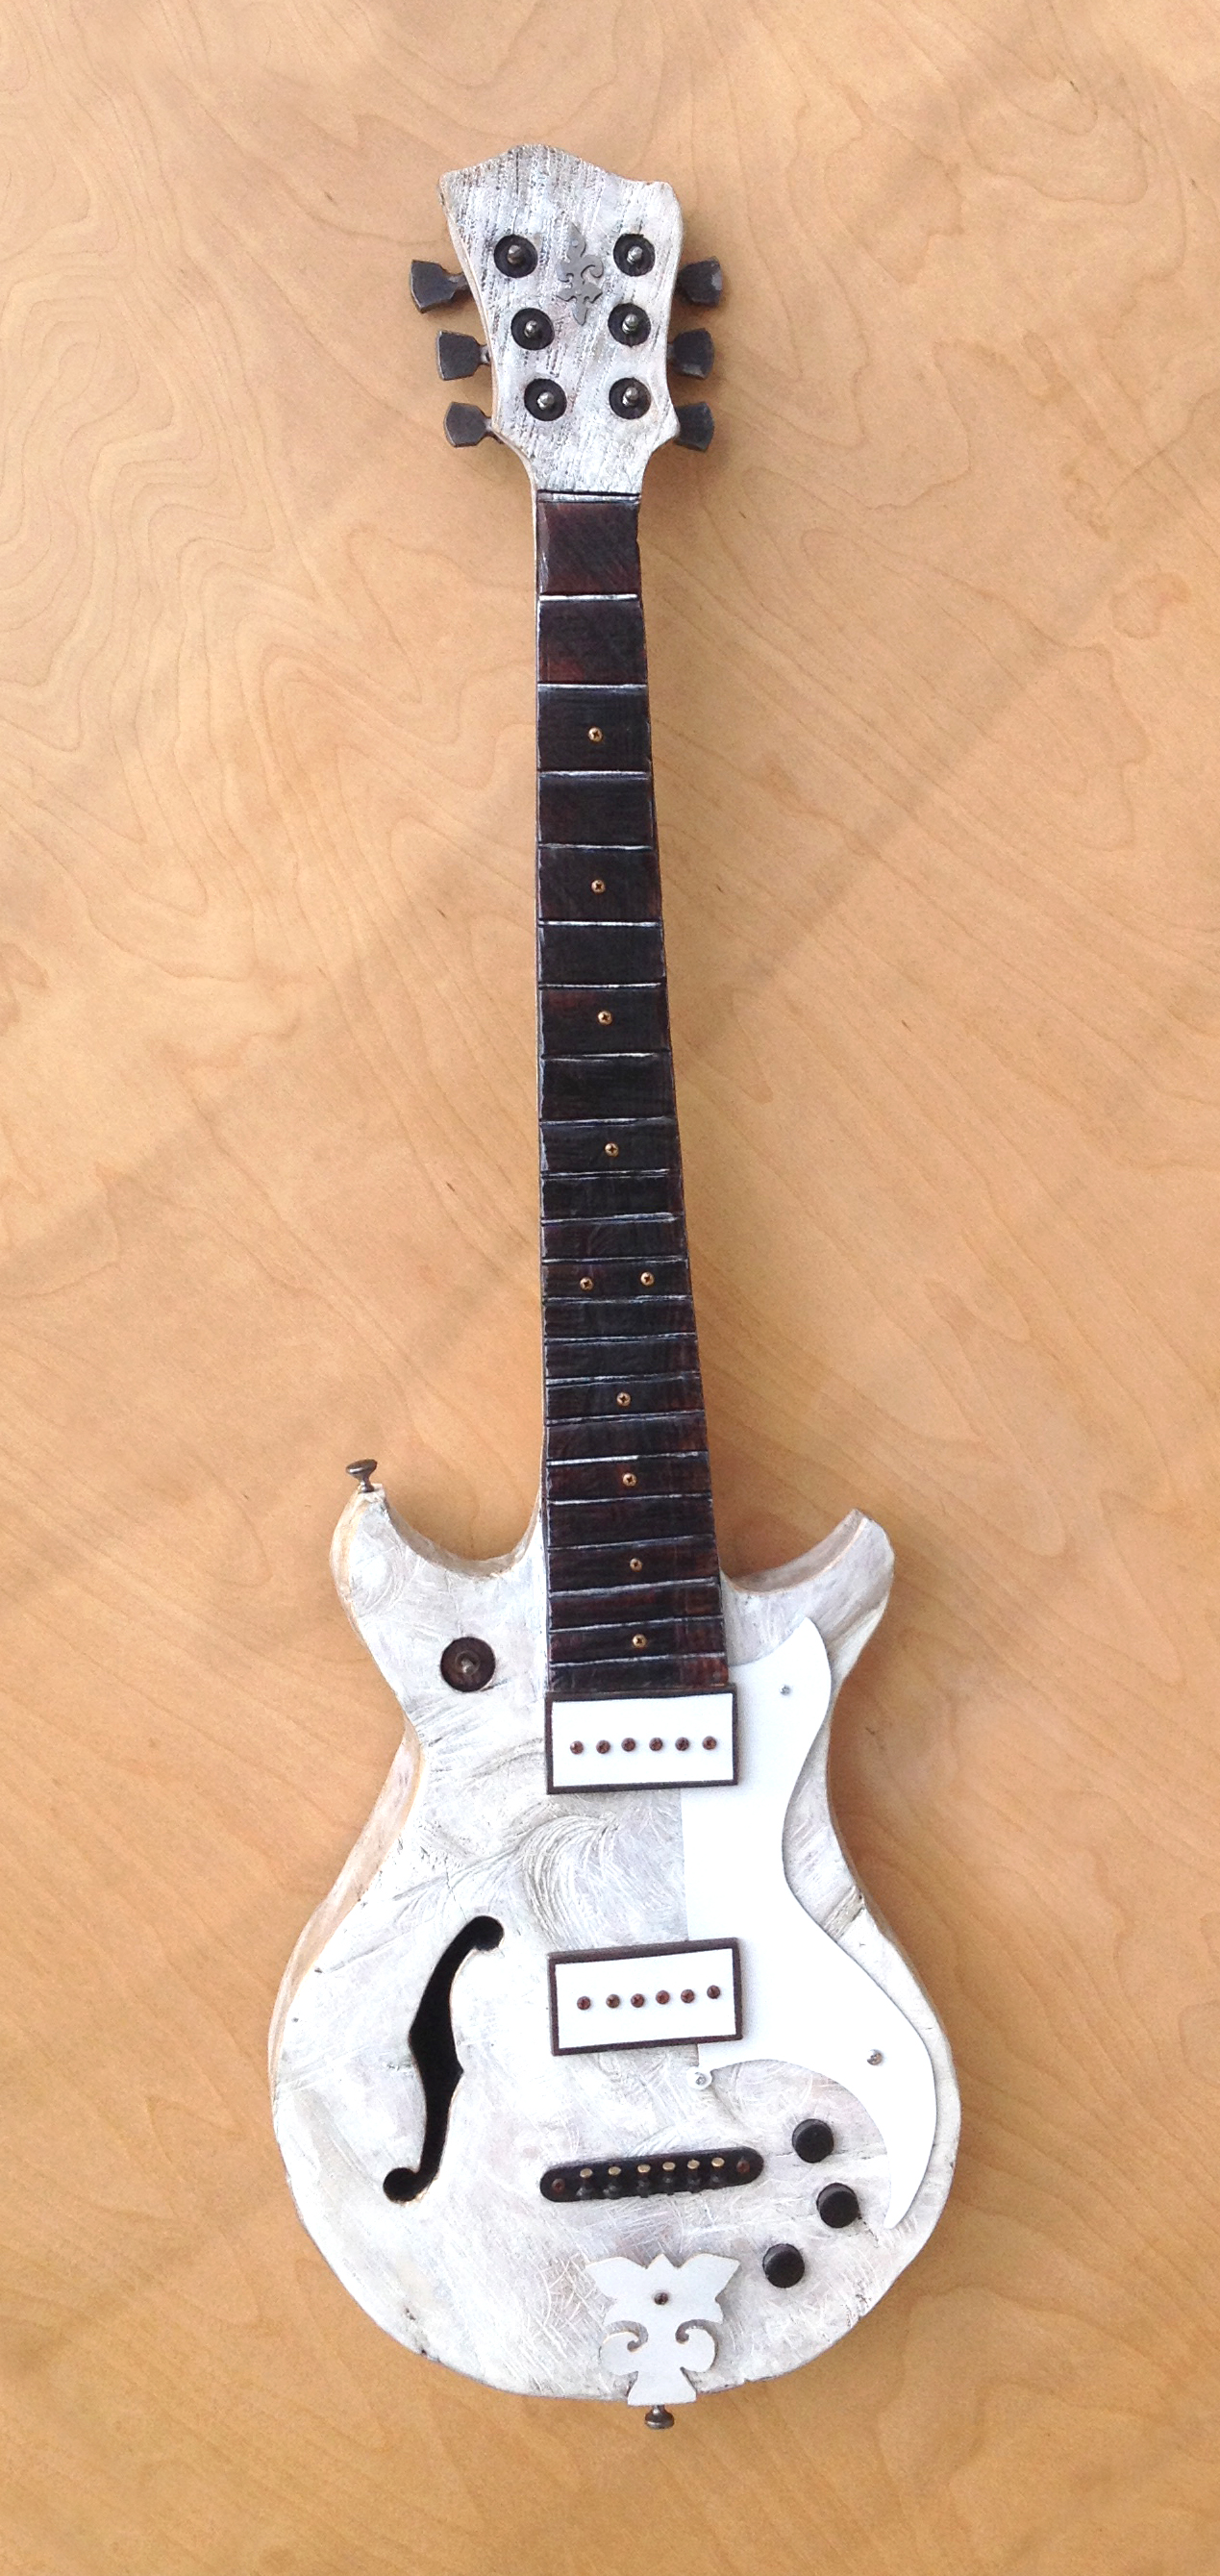 white-fire-guitar-01_25923426574_o.jpg